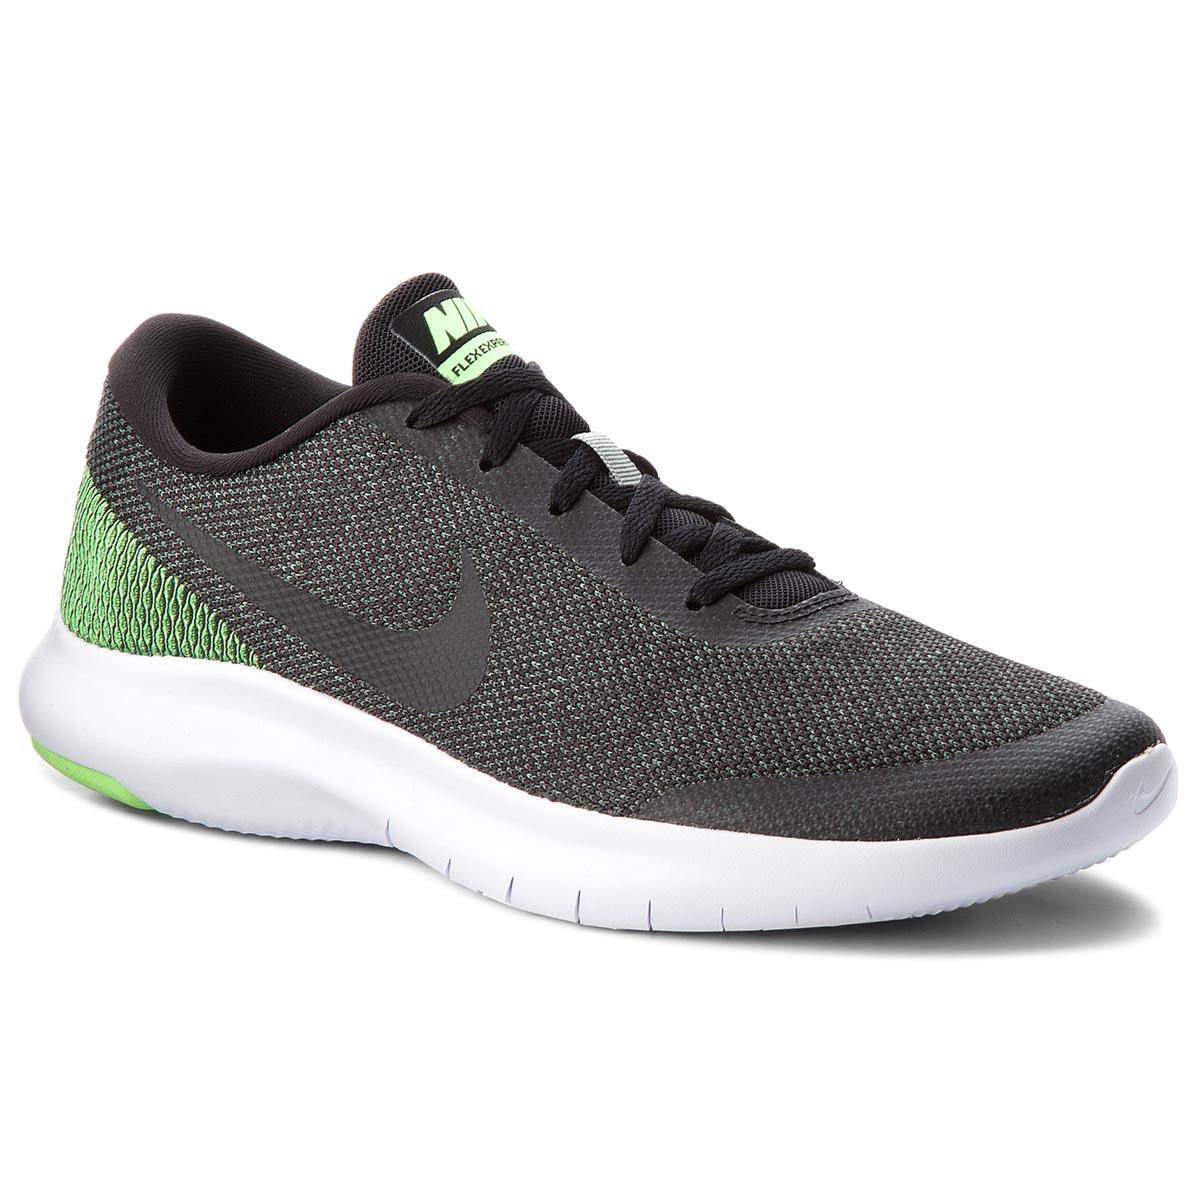 290eb7a56d197 Shoes NIKE Flex Experience Rn 7 908985 300 Mica Green Black Lime Blast